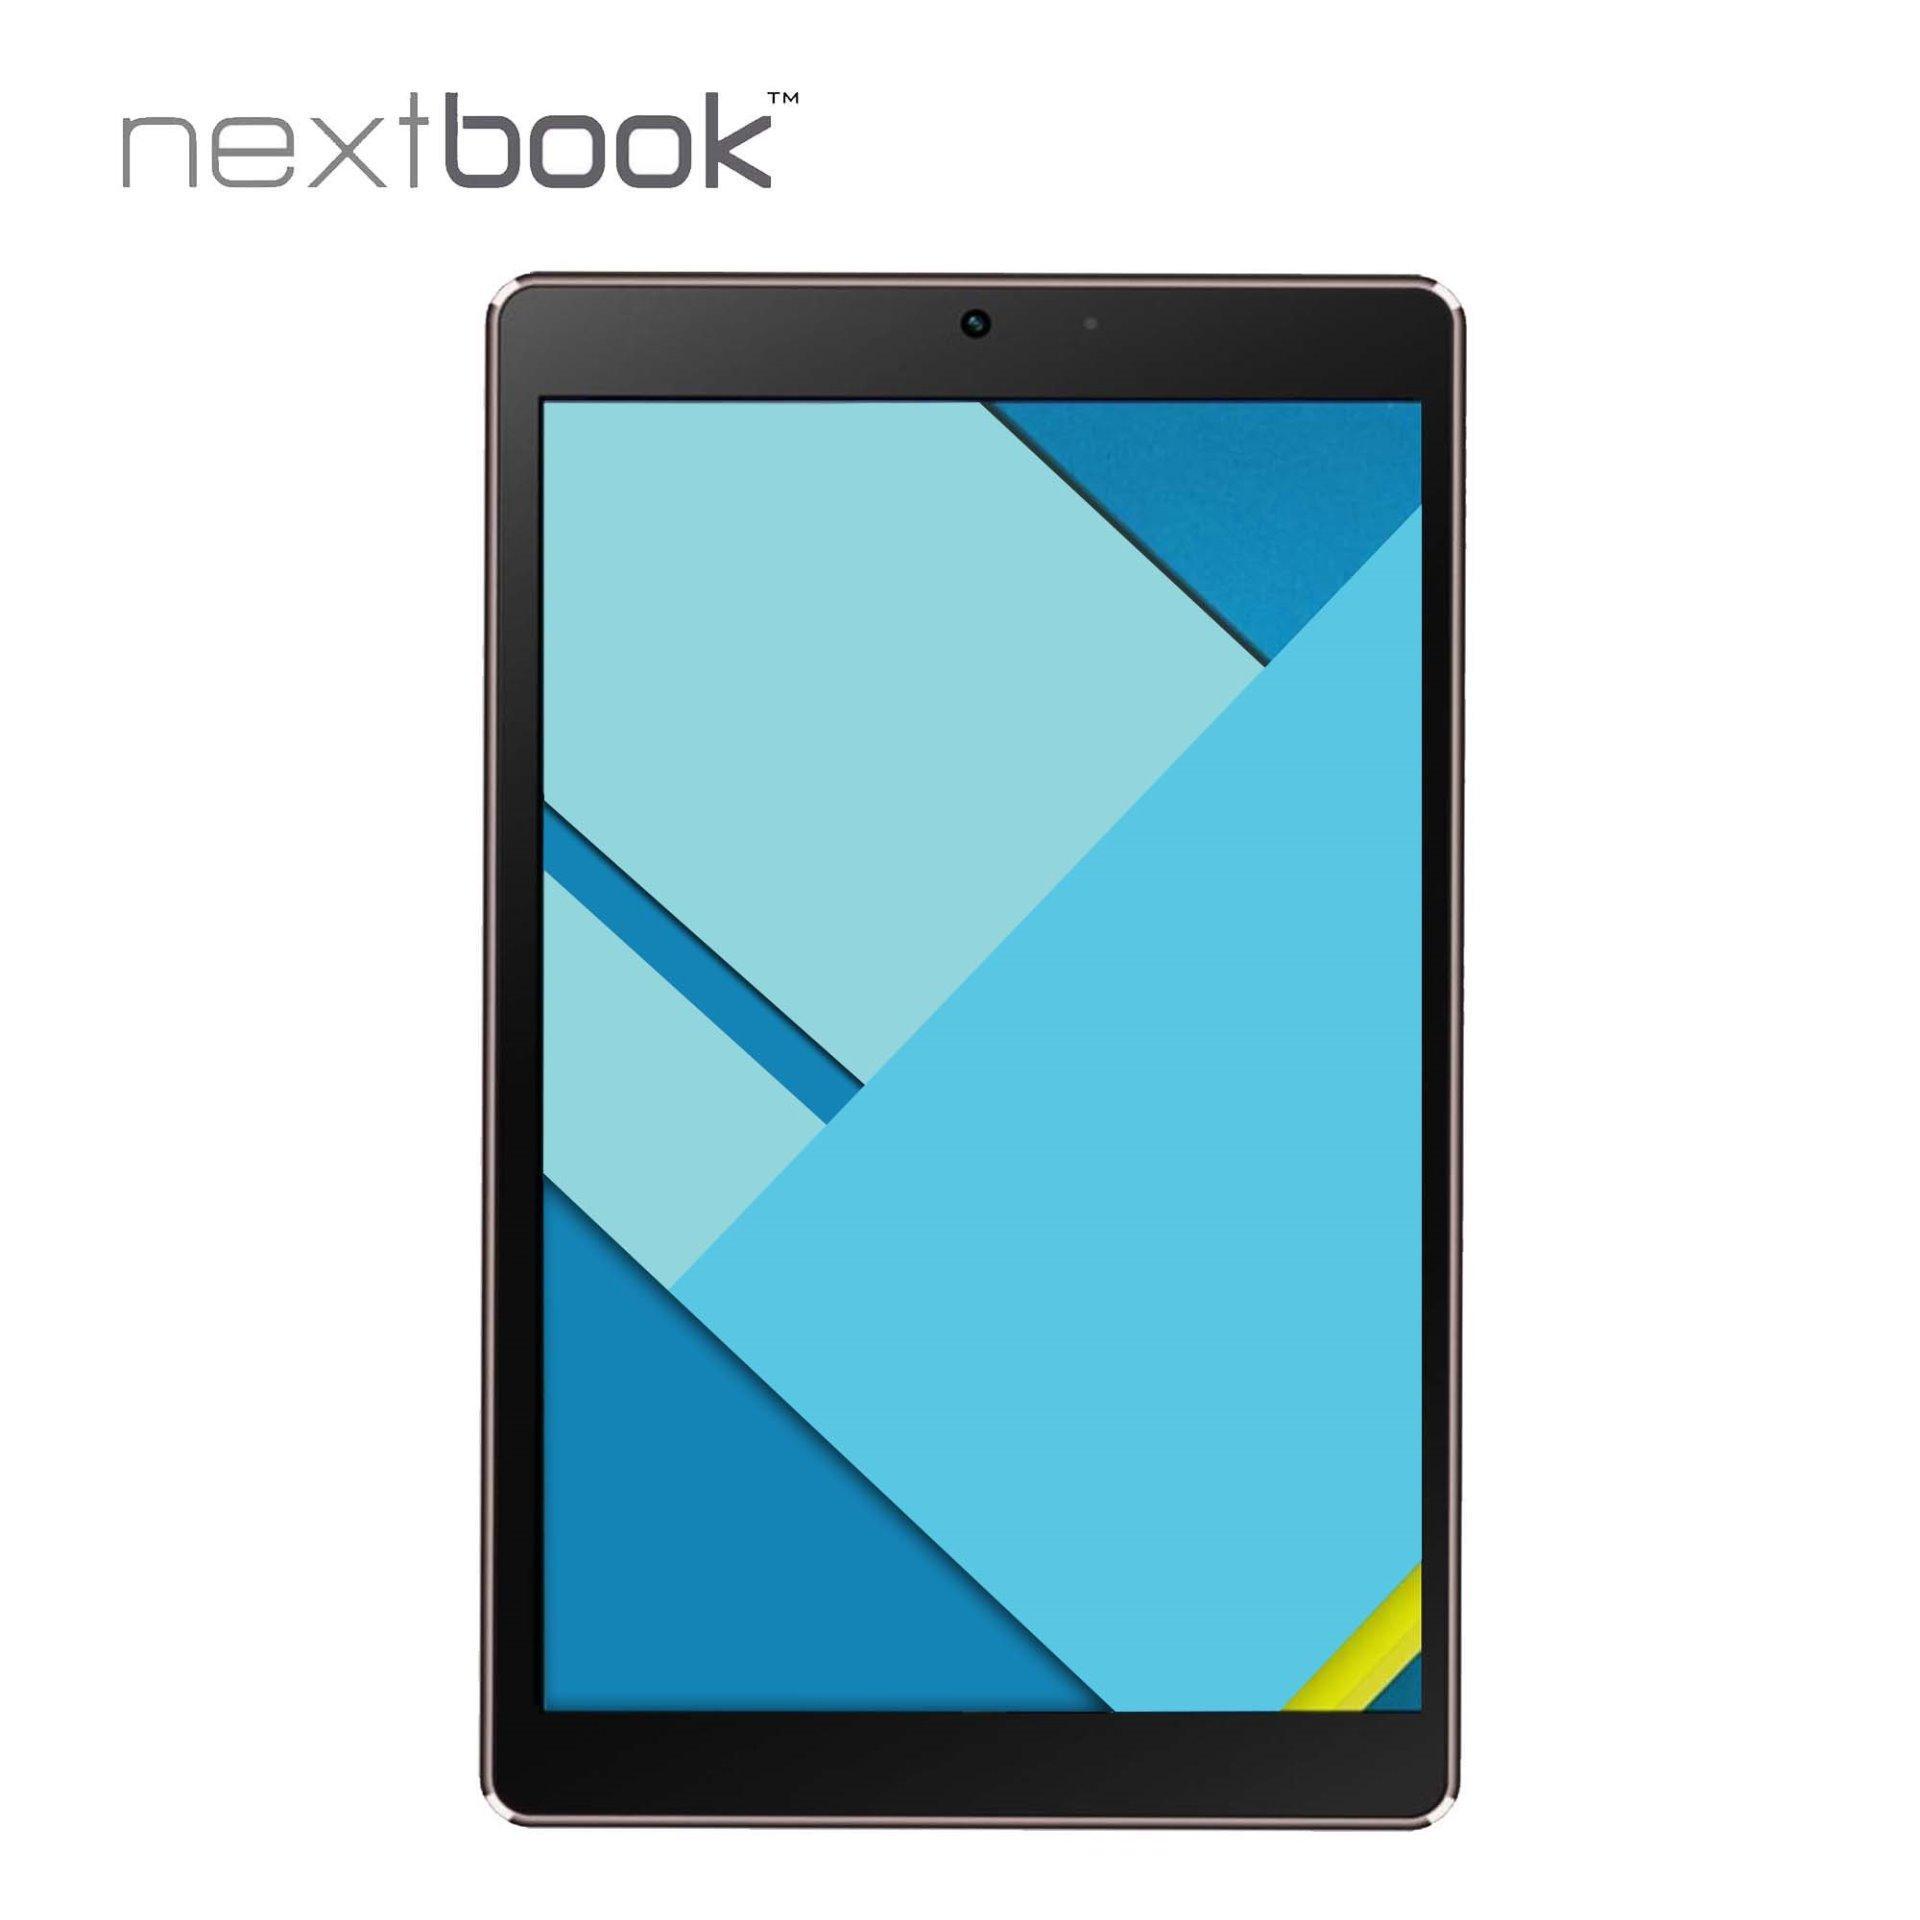 Nextbook Ares 8 16GB - Black